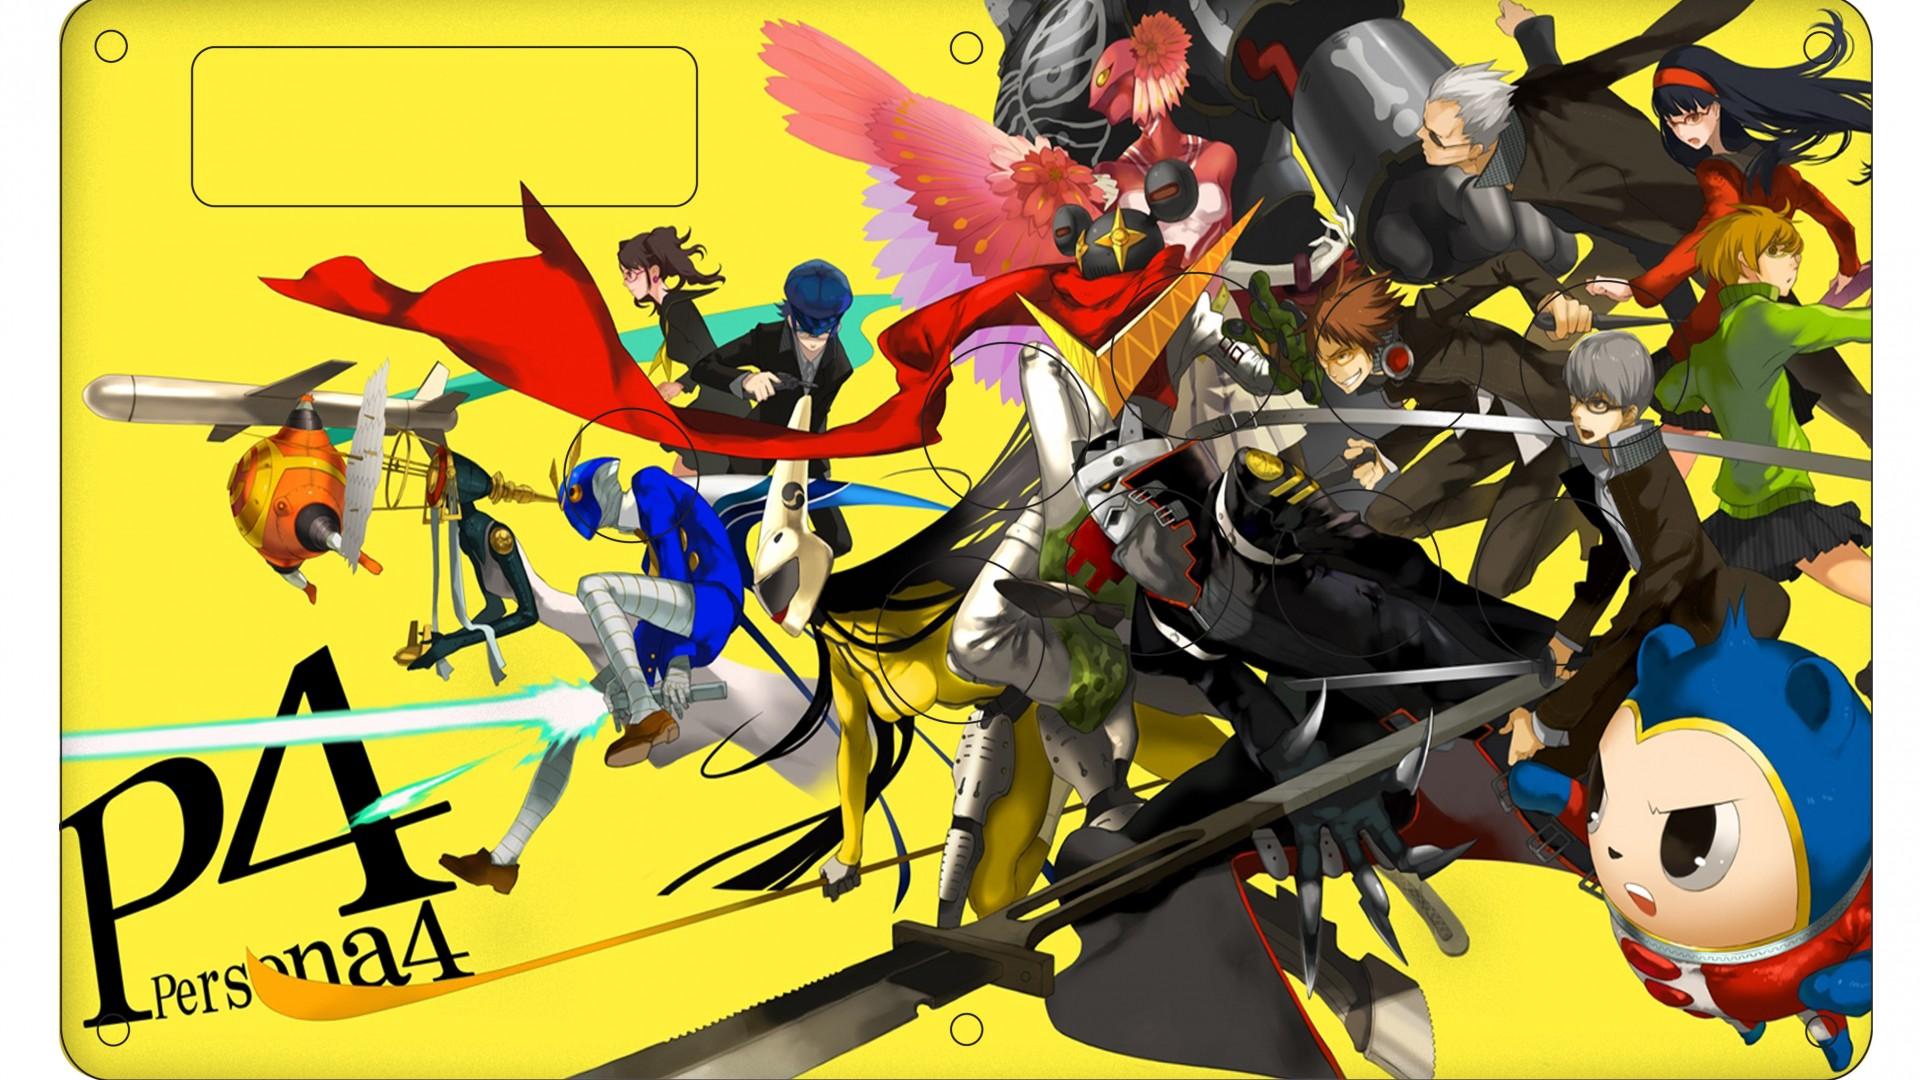 Download Persona 4 Golden Dungeons Persona 4 Golden Max